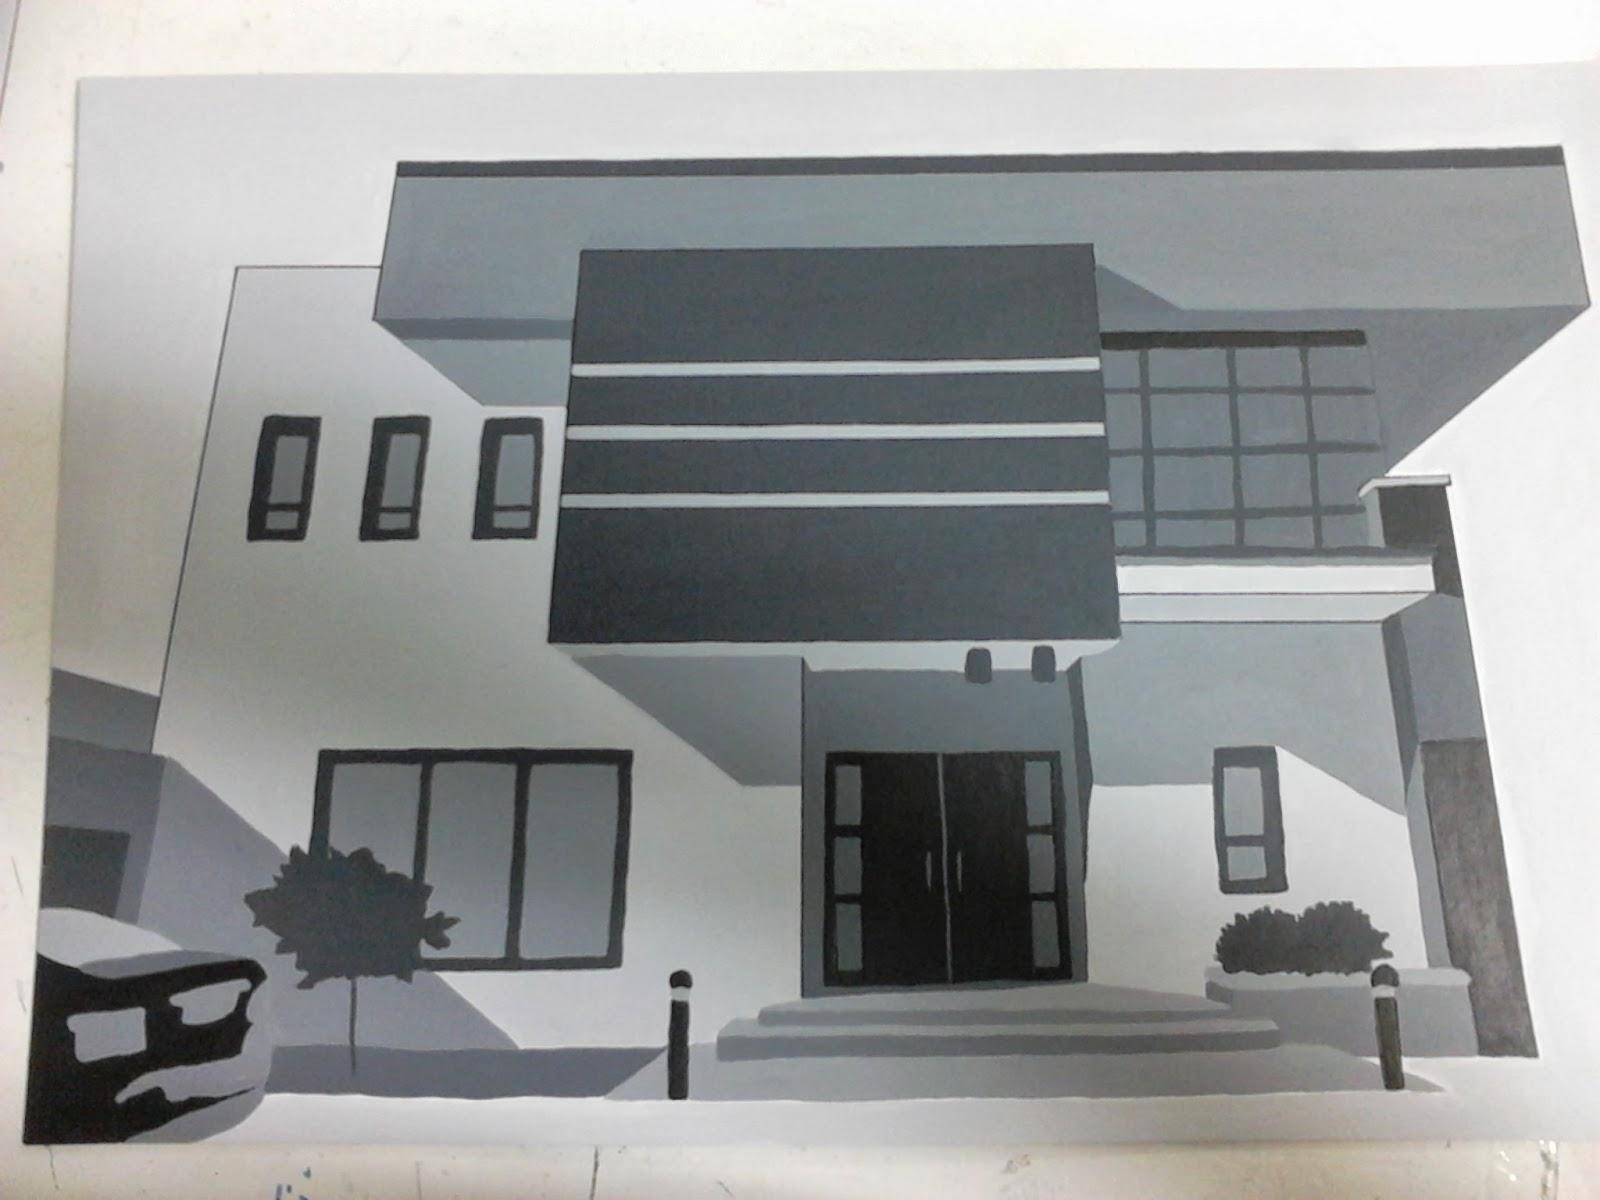 Teoria del color examen ordinario fachada pintada en for Casas pintadas de gris